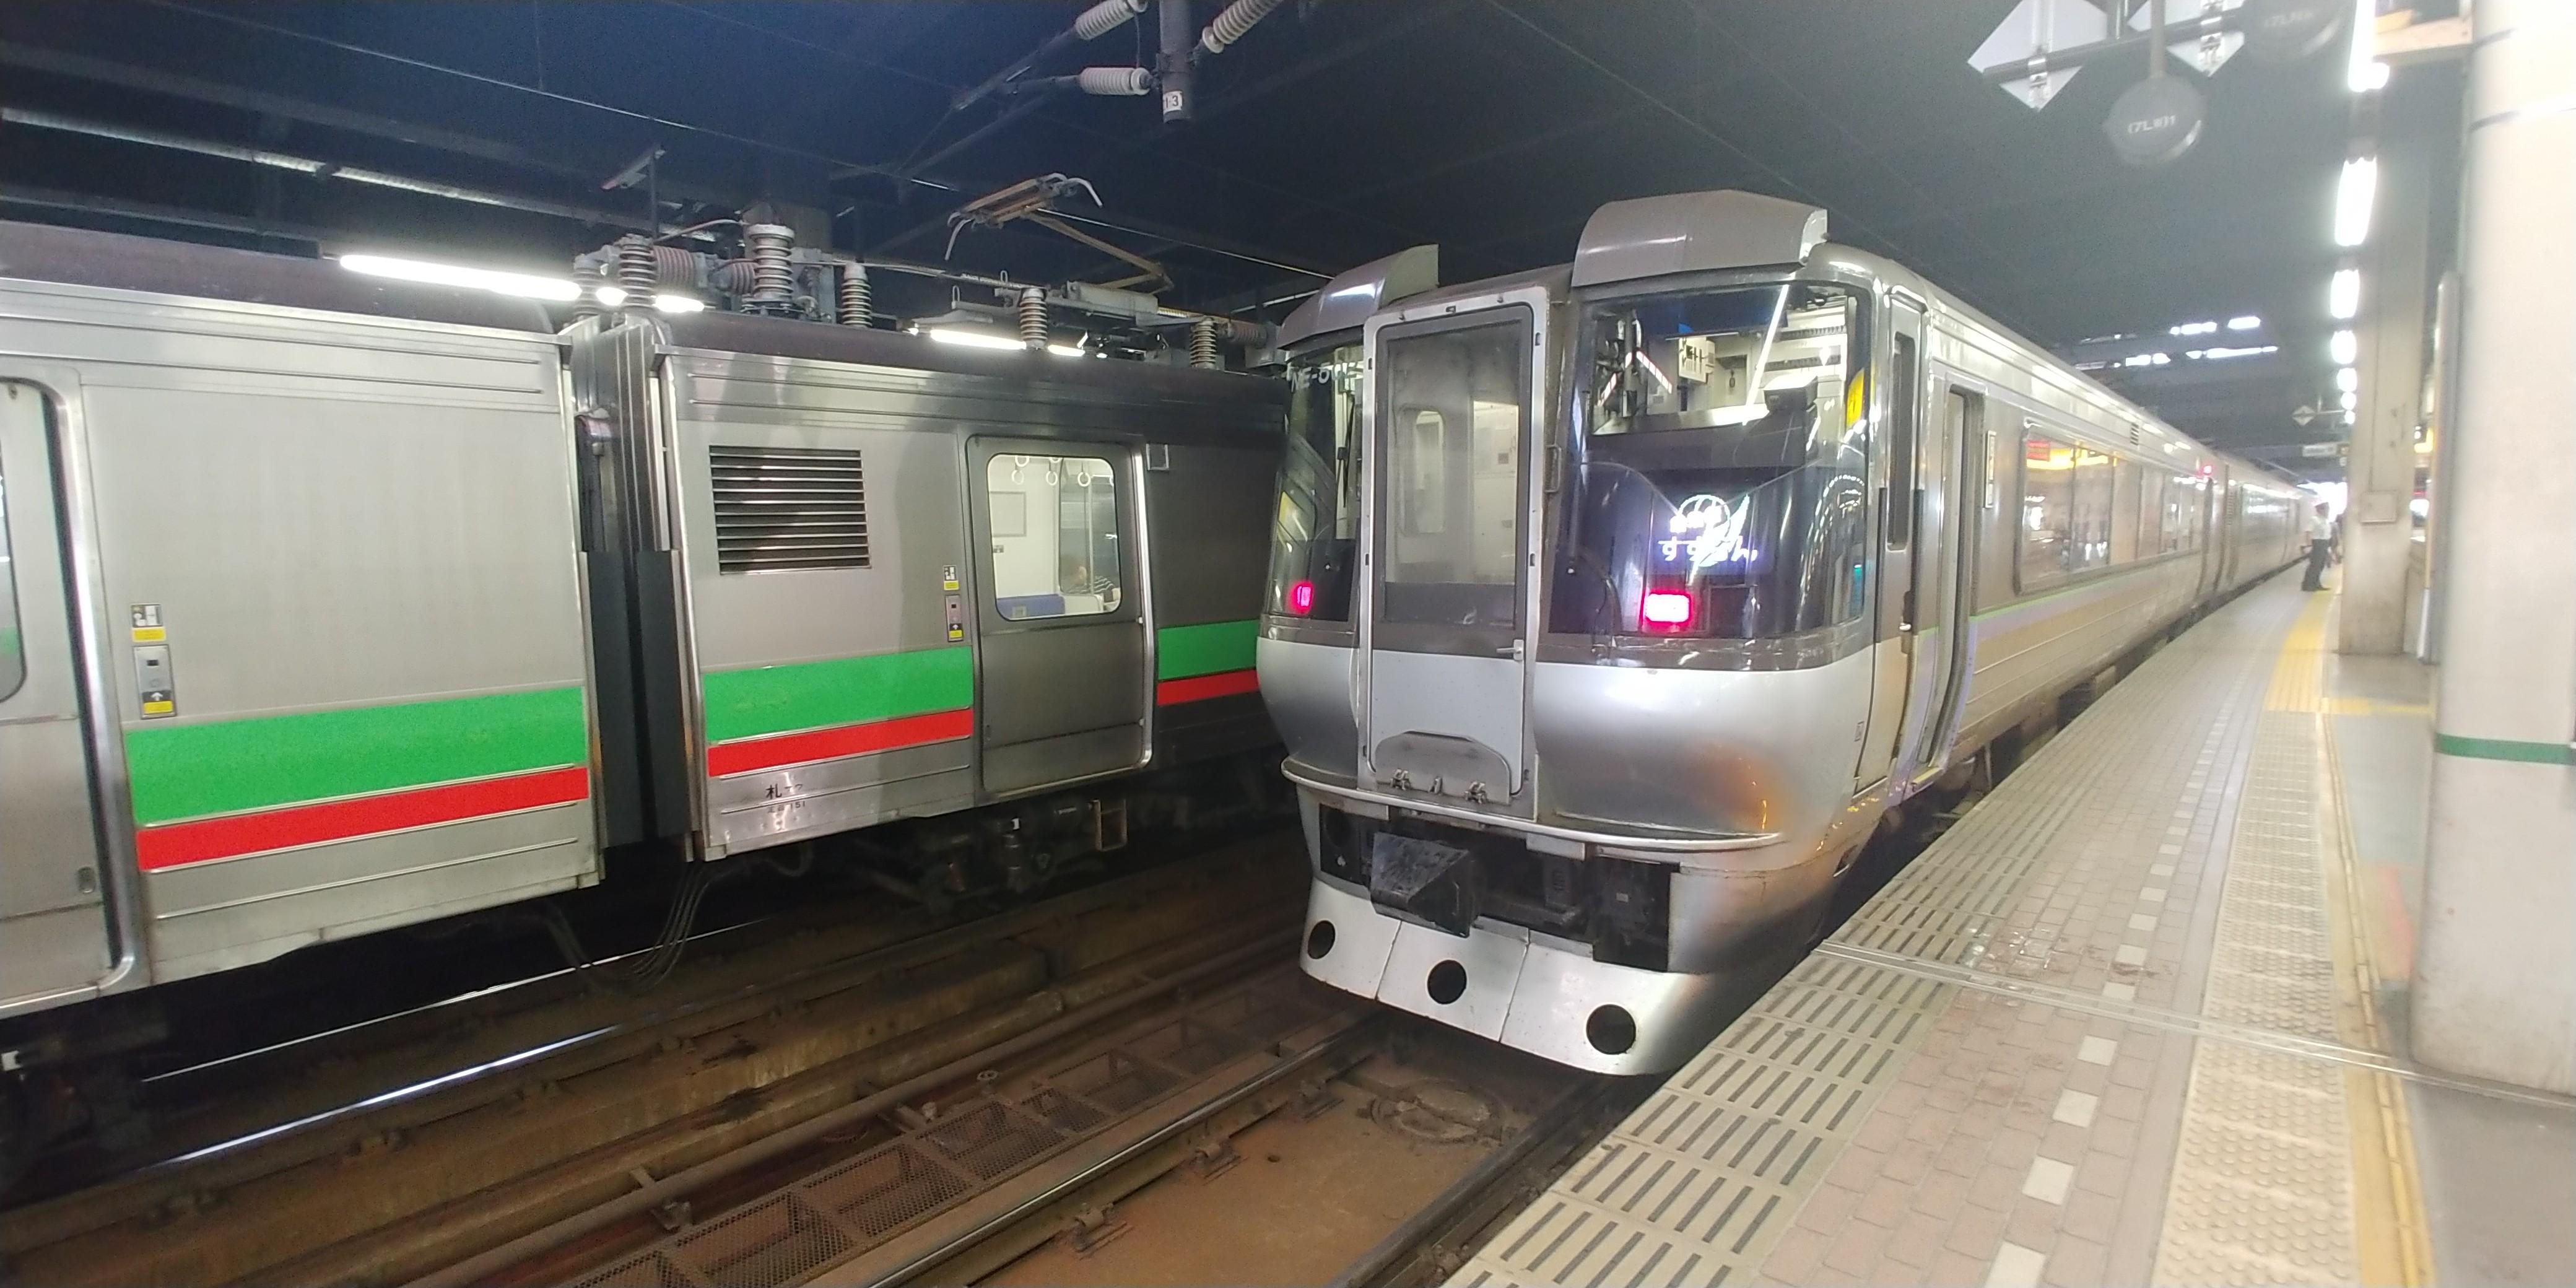 f:id:kishuji-kaisoku:20191228205829j:image